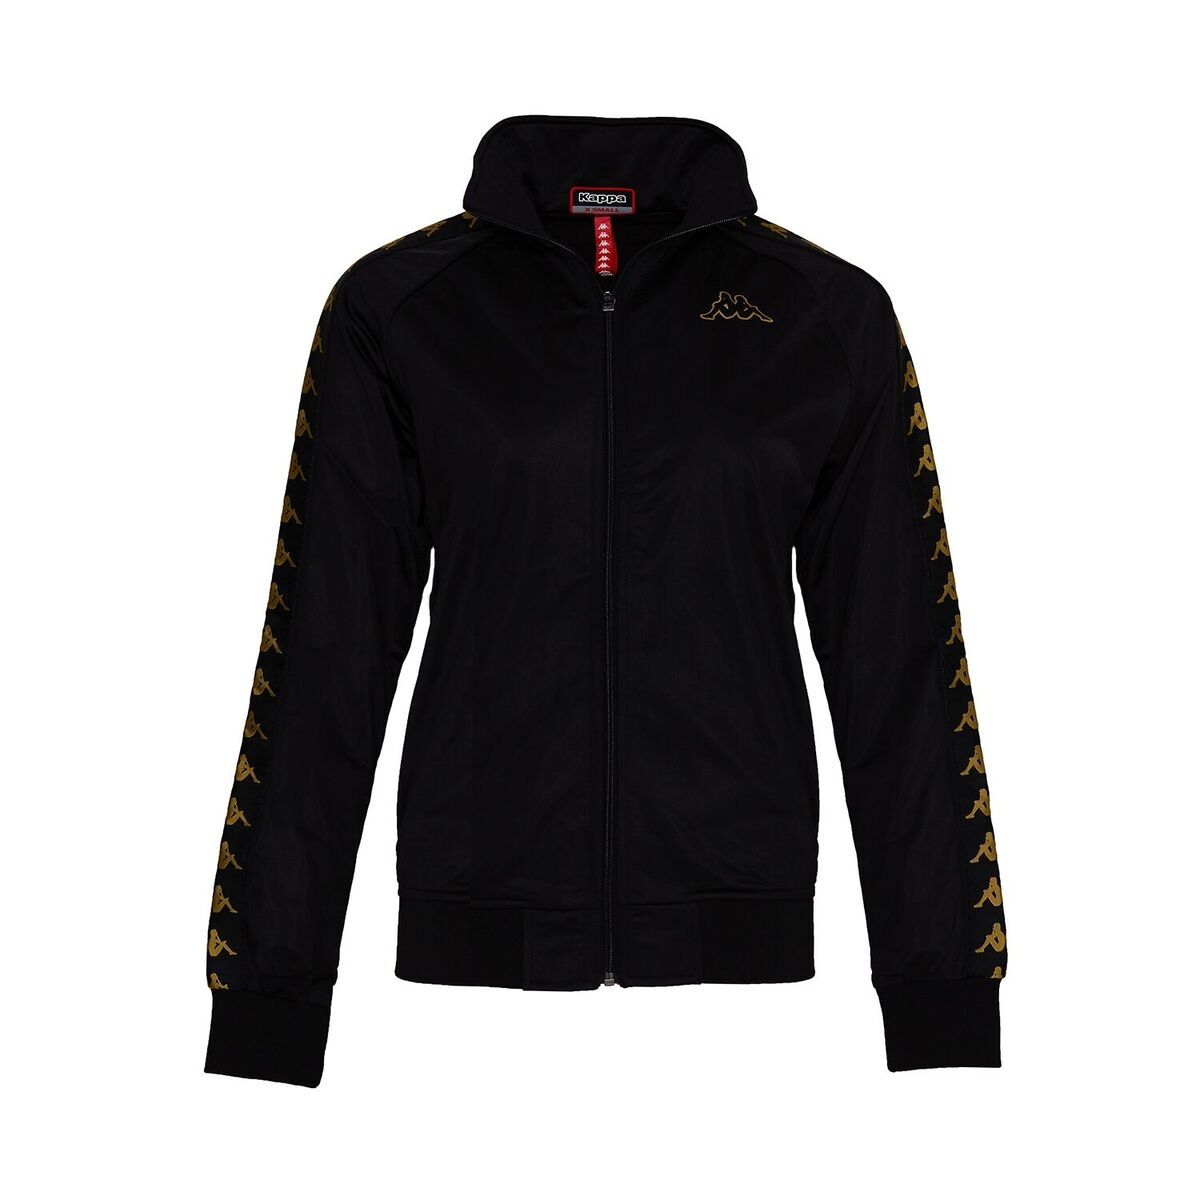 Kappa Kappa Track Jacket, Black-Gold